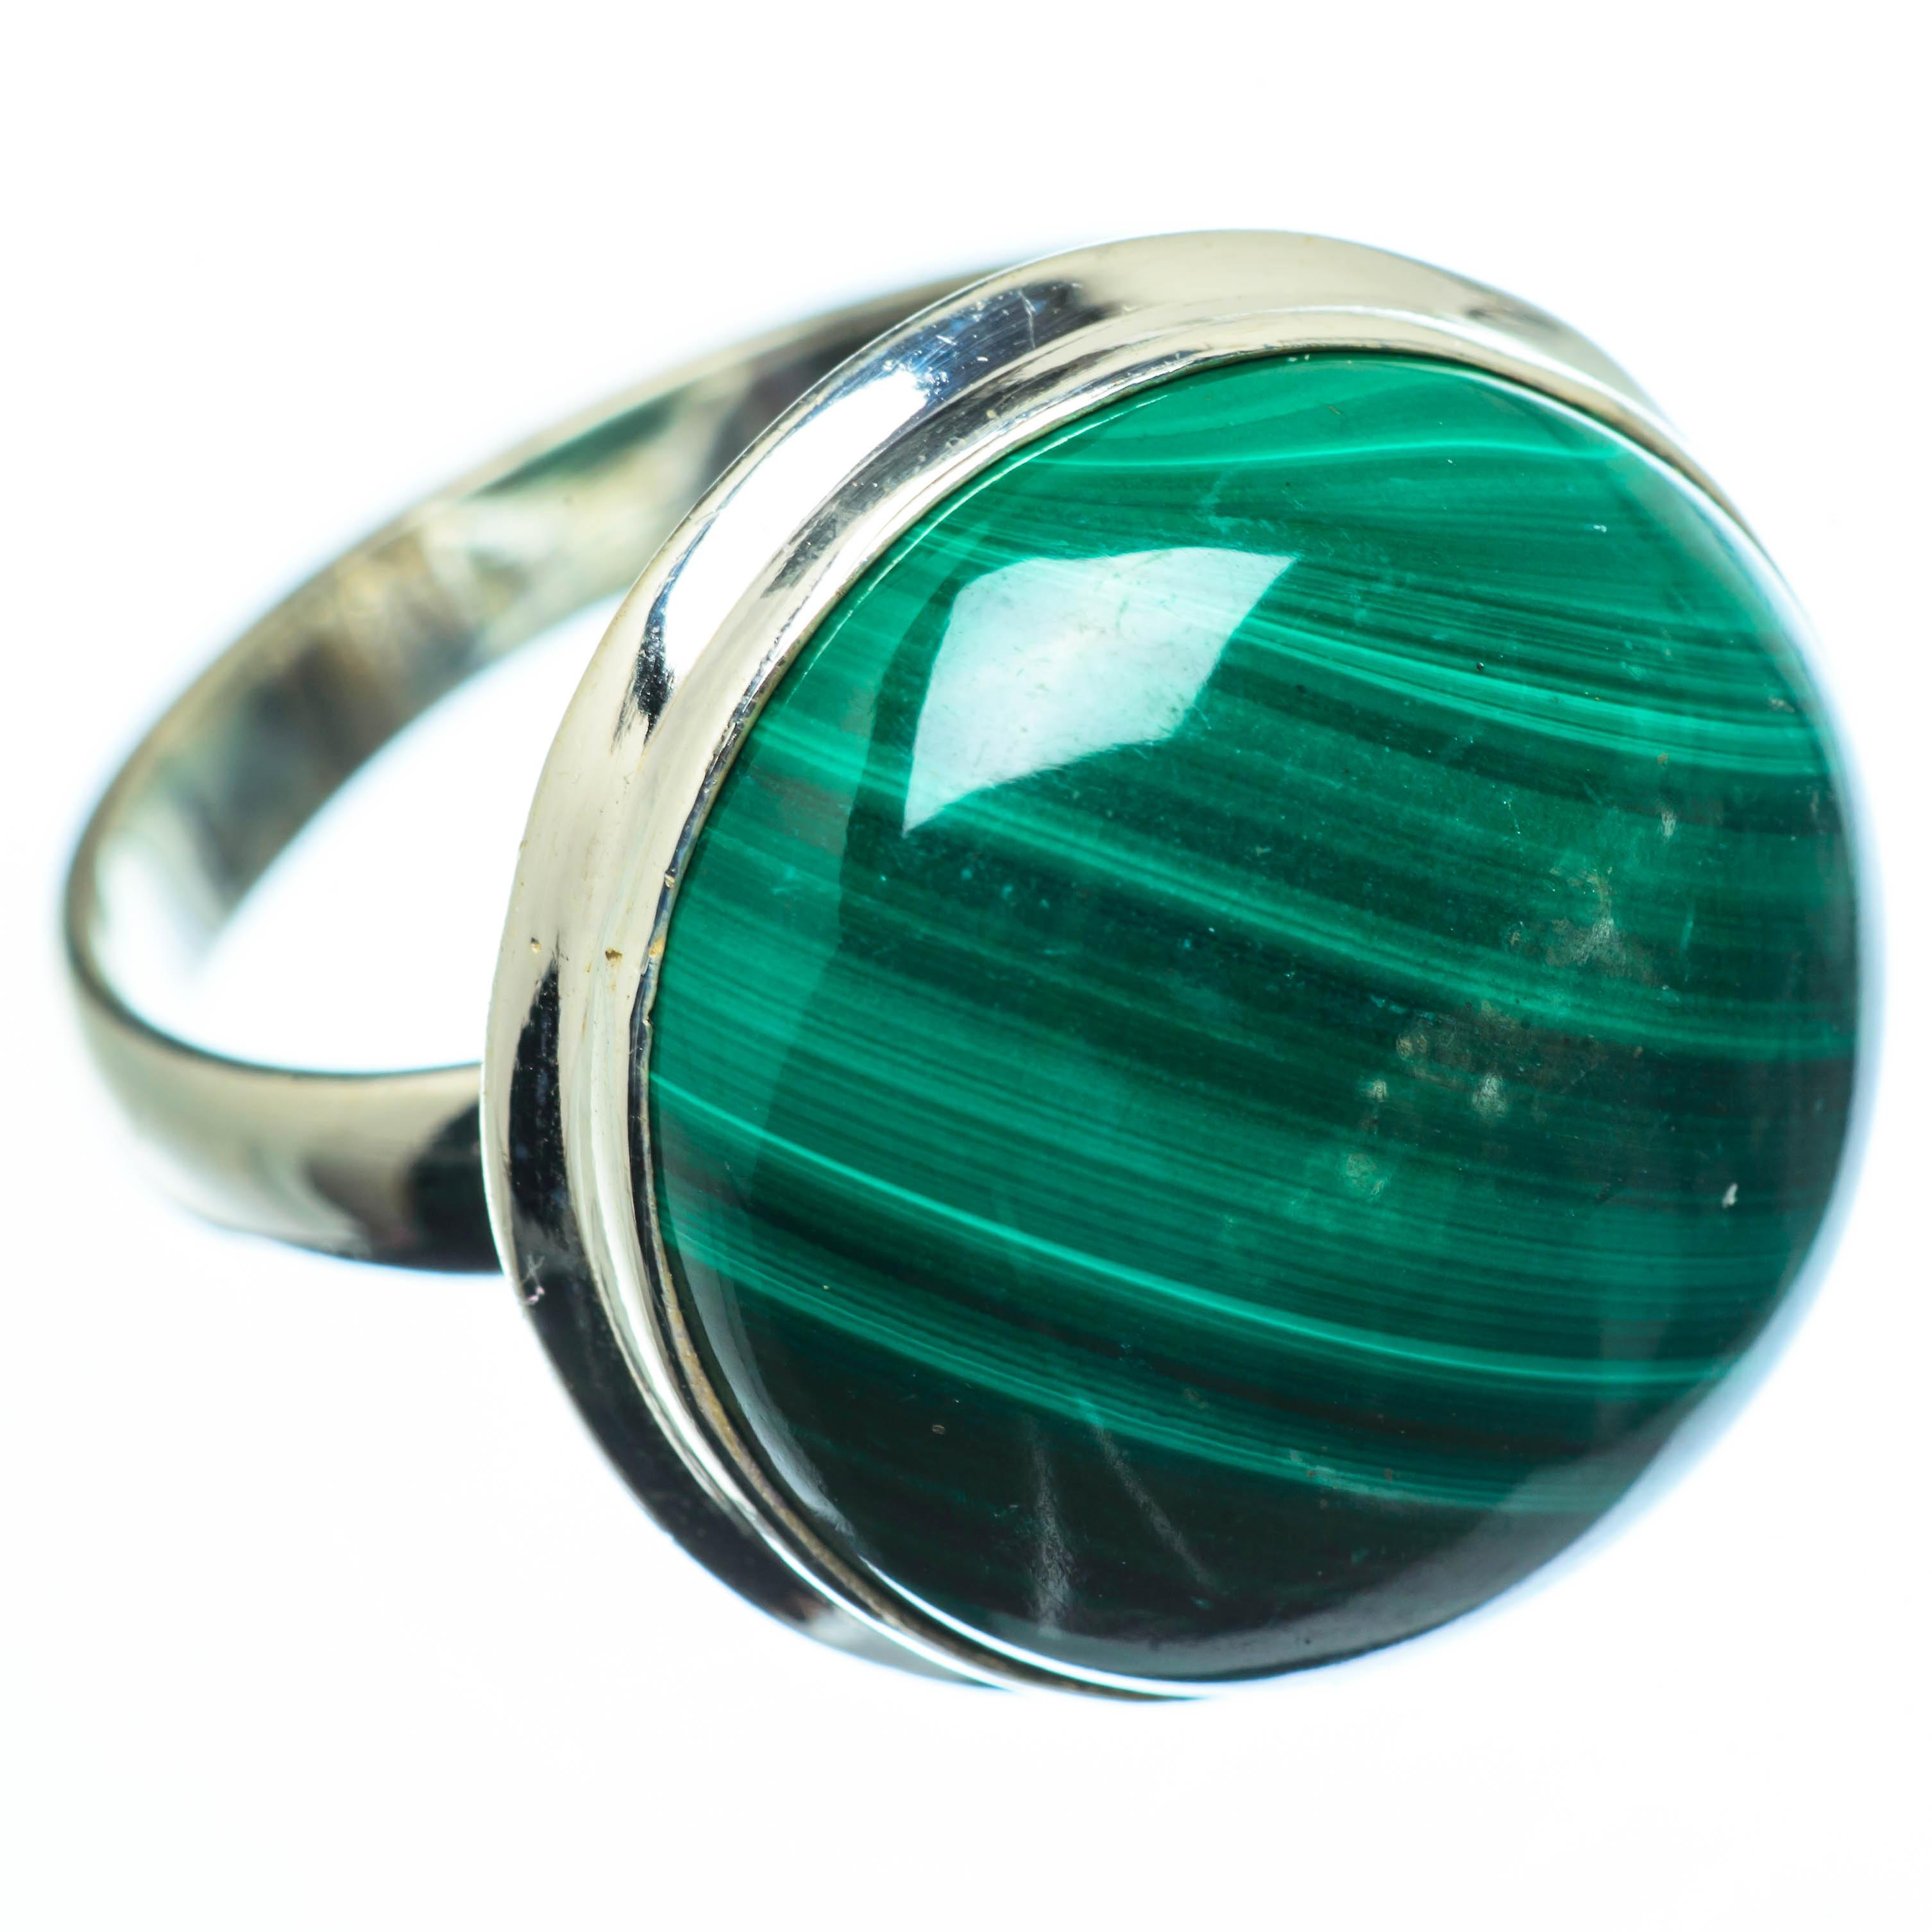 Limited Neu Fantastisk pris Large Malachite Ring Size 10 (925 Sterling Silver)  - Handmade Boho Vintage Jewelry RING28206 nysv0